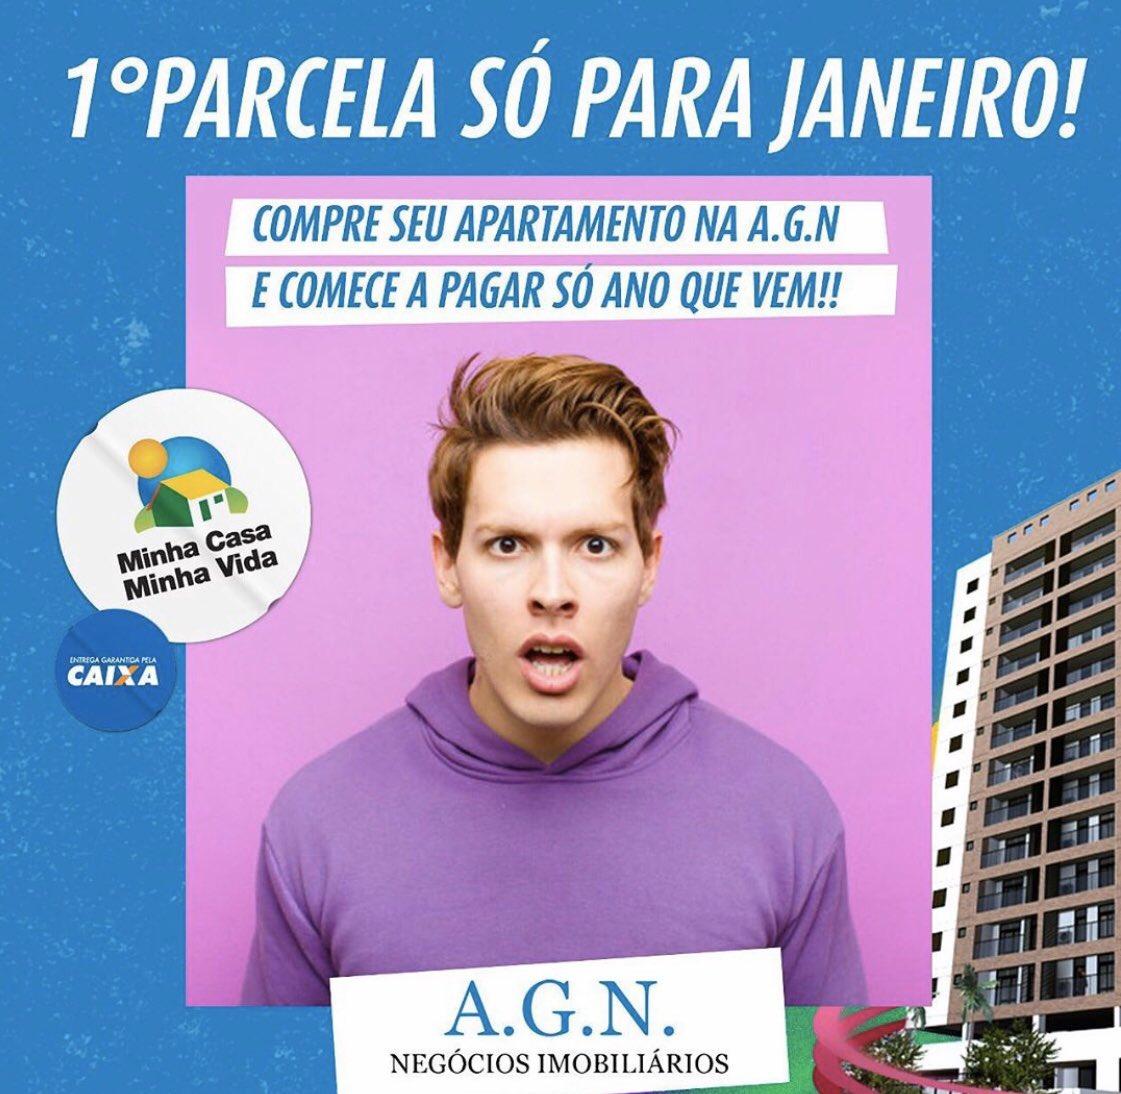 https://www.instagram.com/p/CAX6G6rFvlS/?igshid=16icr8gsx27gb… #imobiliaria #imoveis #boatarde #maio2020 #vem #sp #vilacarrãopic.twitter.com/U2ES2LYFgT